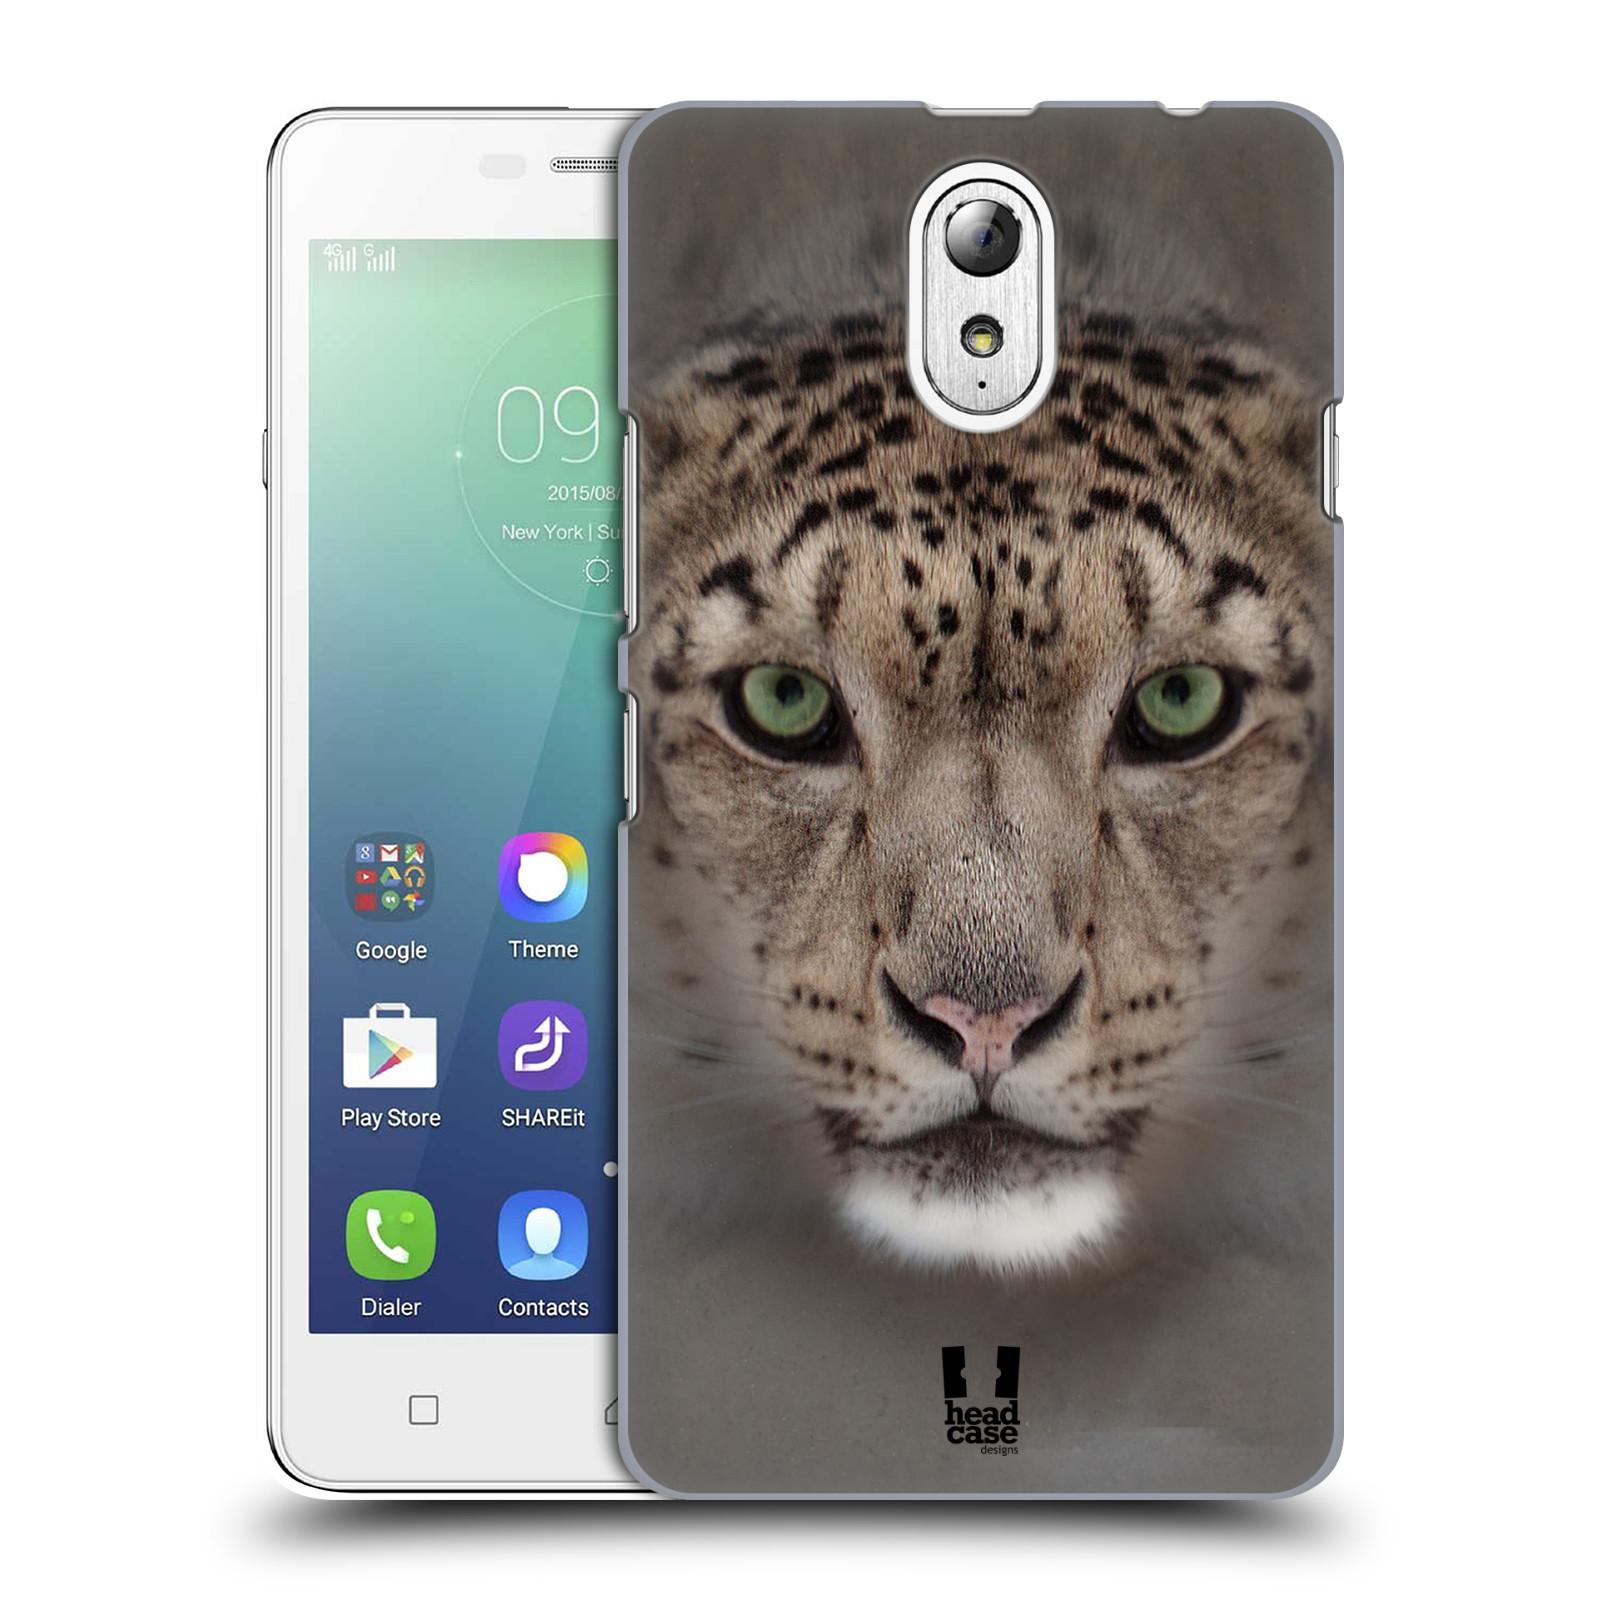 HEAD CASE pevný plastový obal na mobil LENOVO VIBE P1m / LENOVO VIBE p1m DUAL SIM vzor Zvířecí tváře 2 sněžný leopard